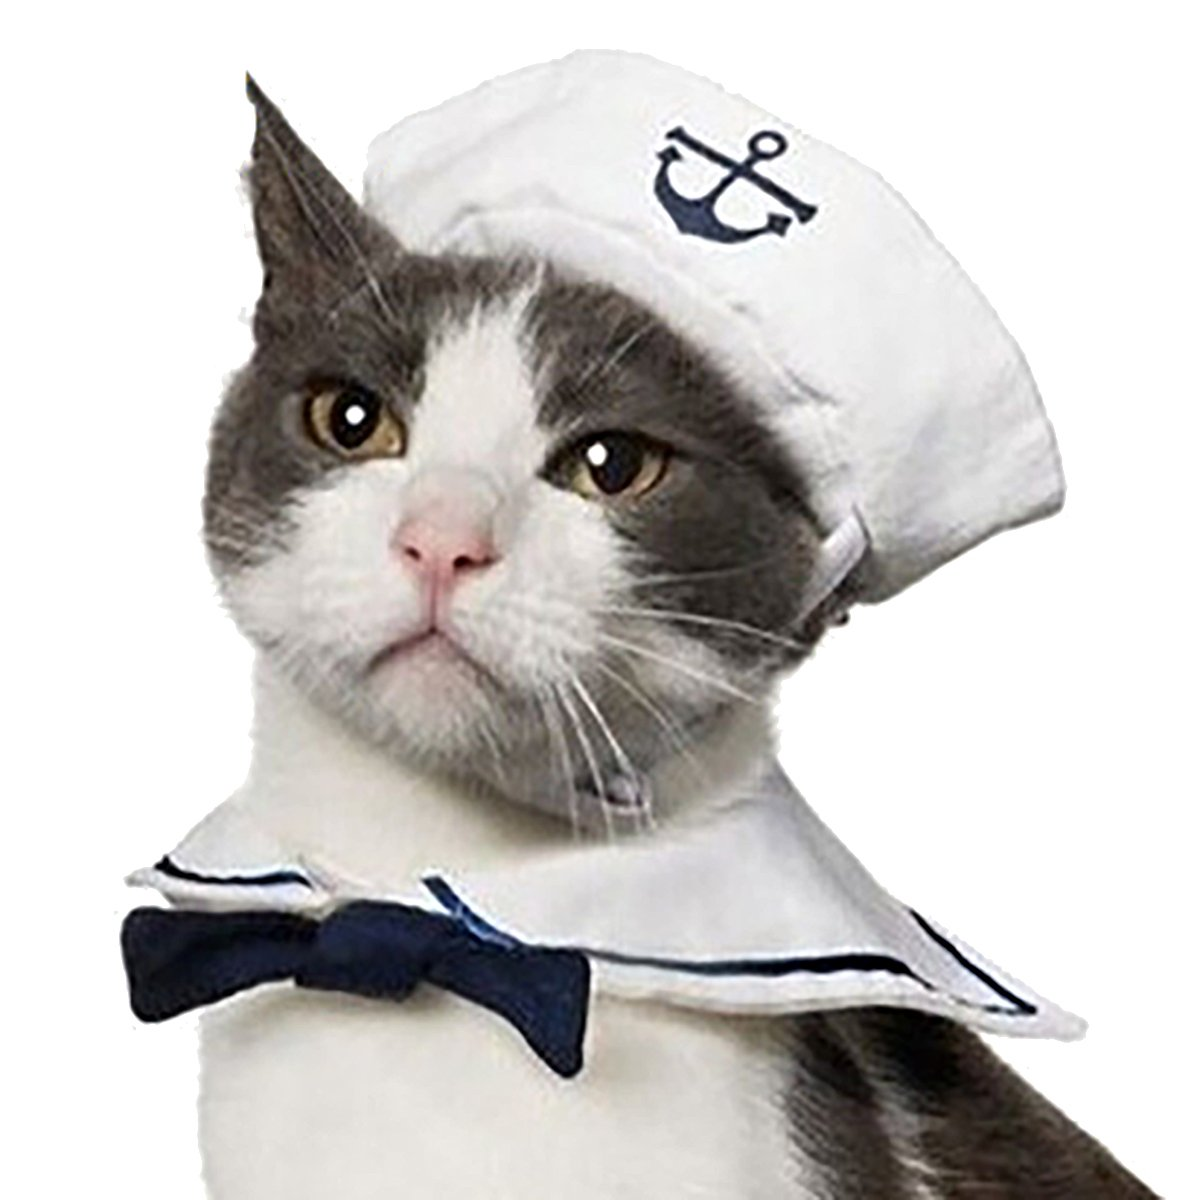 LiangGui Puppy and Cat Cosplay Peacock Costume, Pet Navy Sailor Hat 1 Pcs LG00AJ01SZ